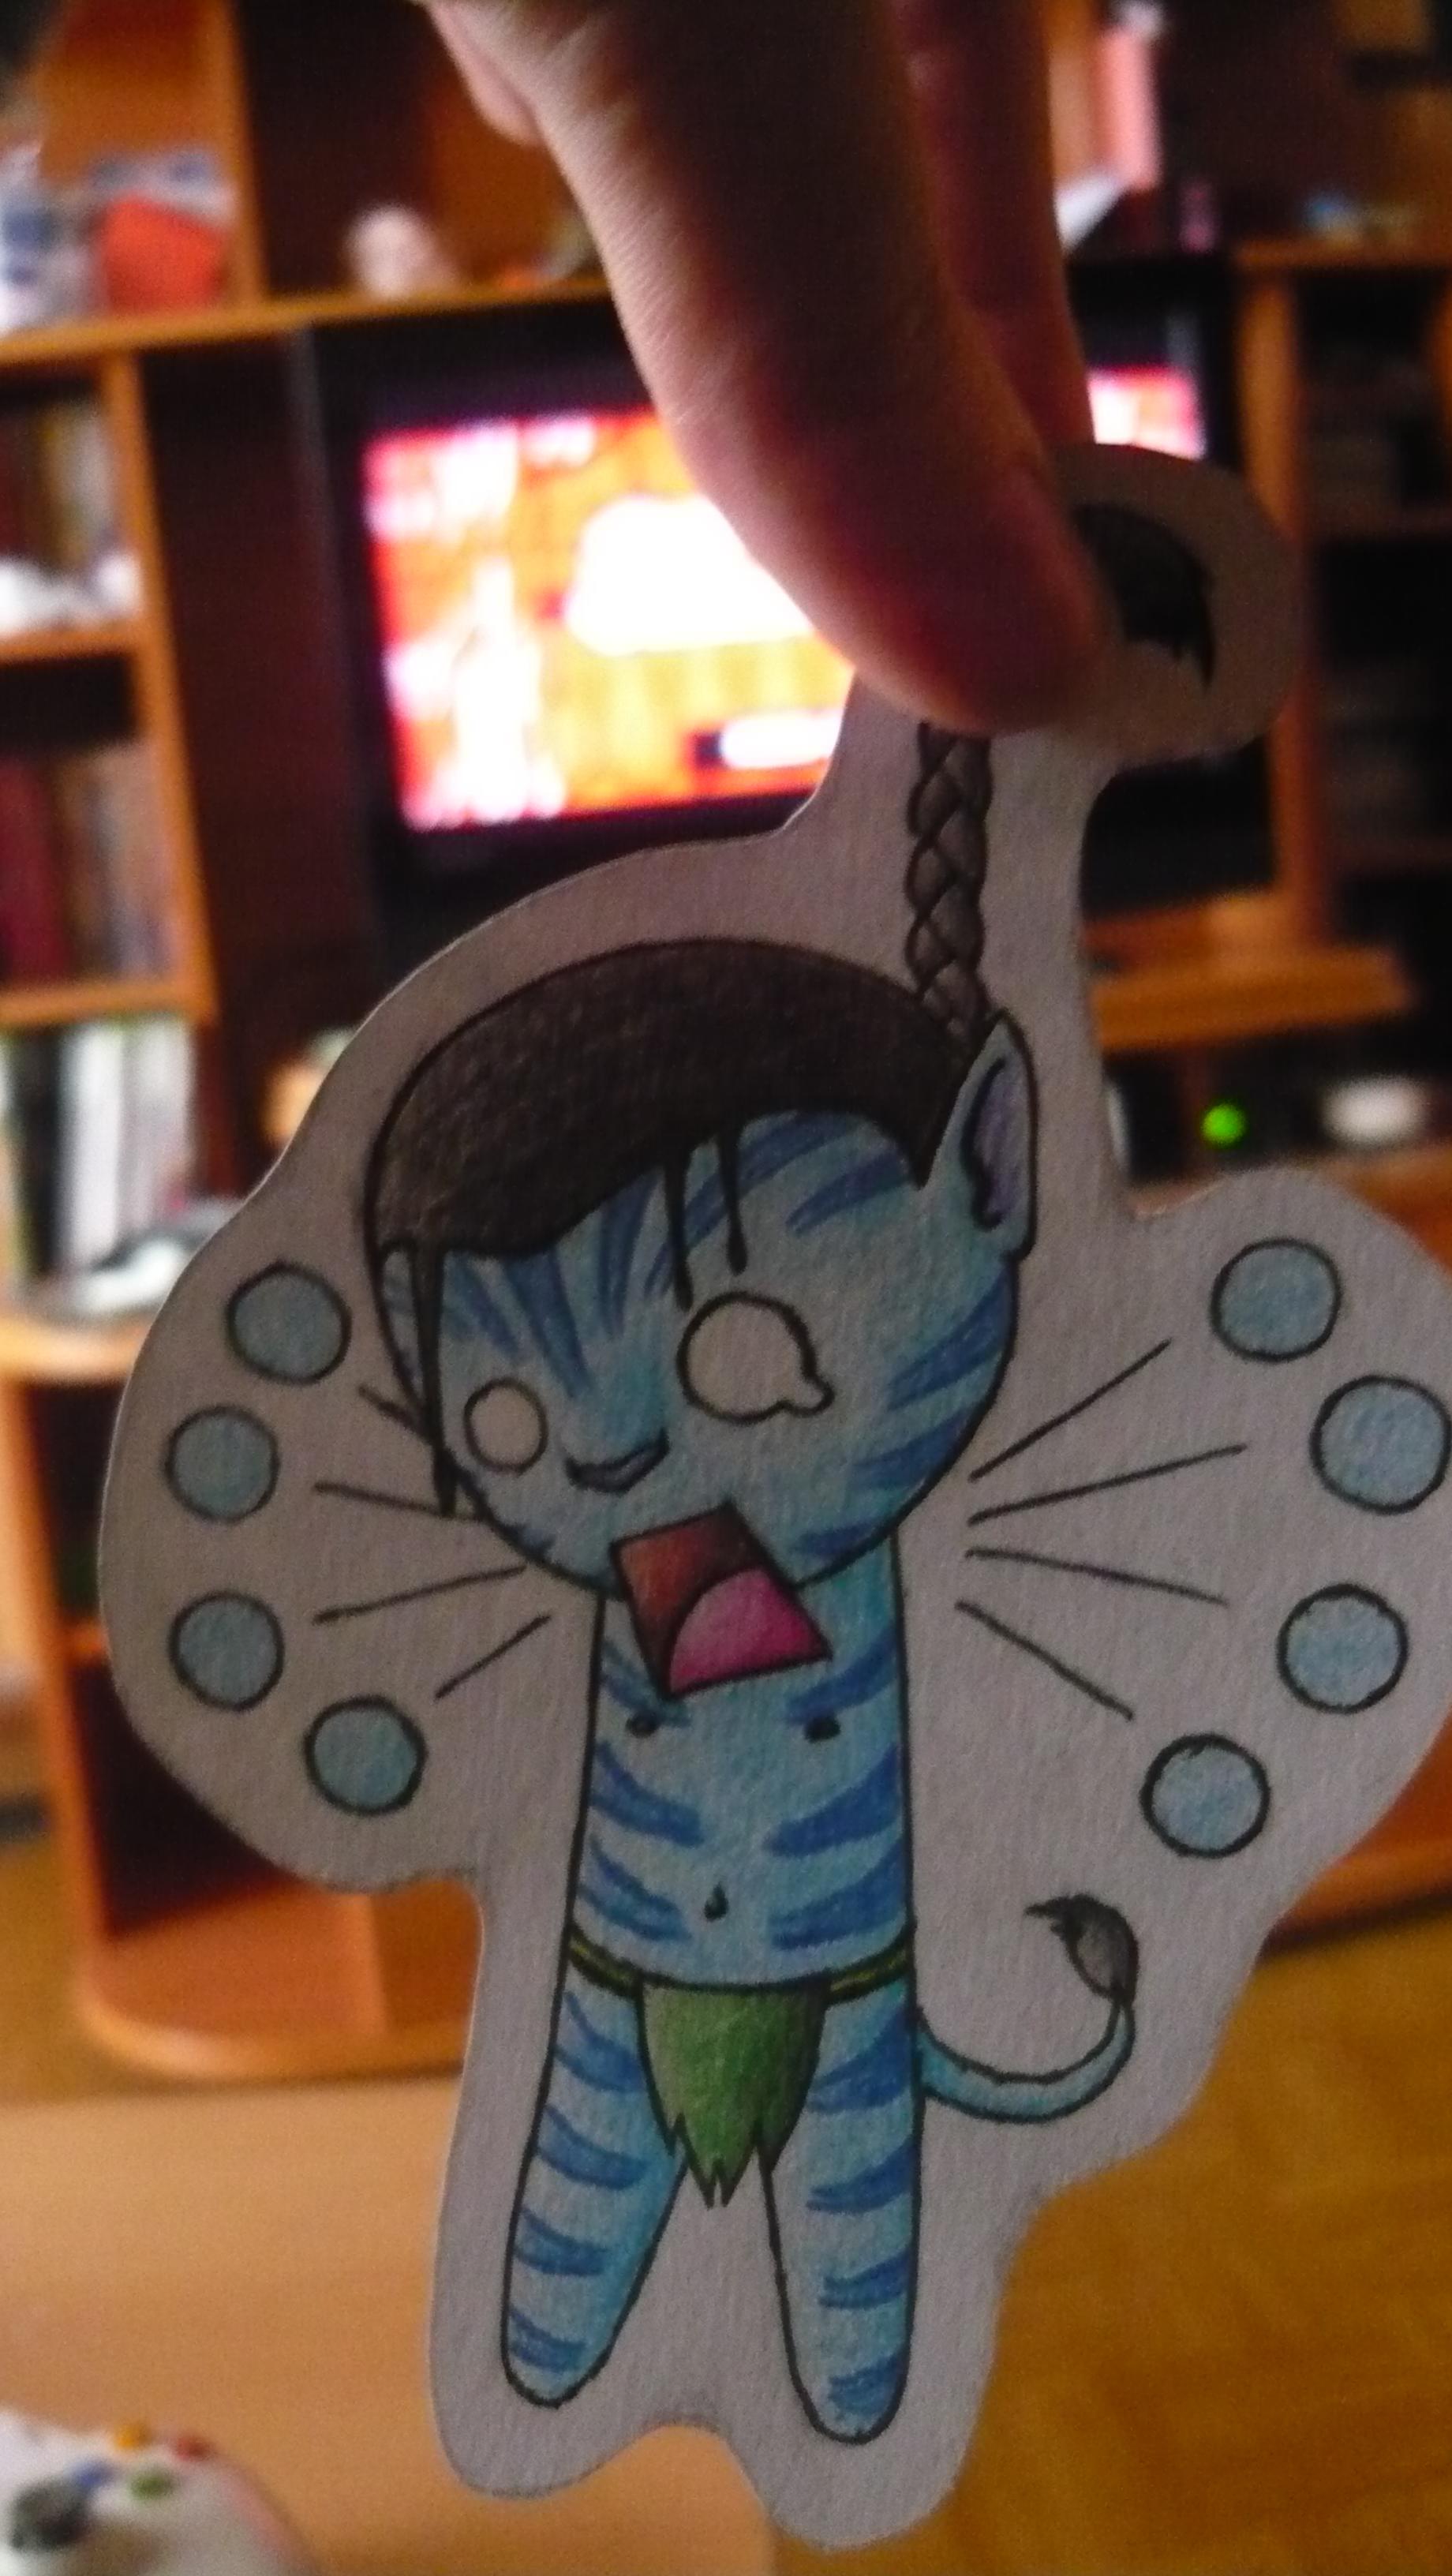 Jake Sully Paper Child by Kisviki96